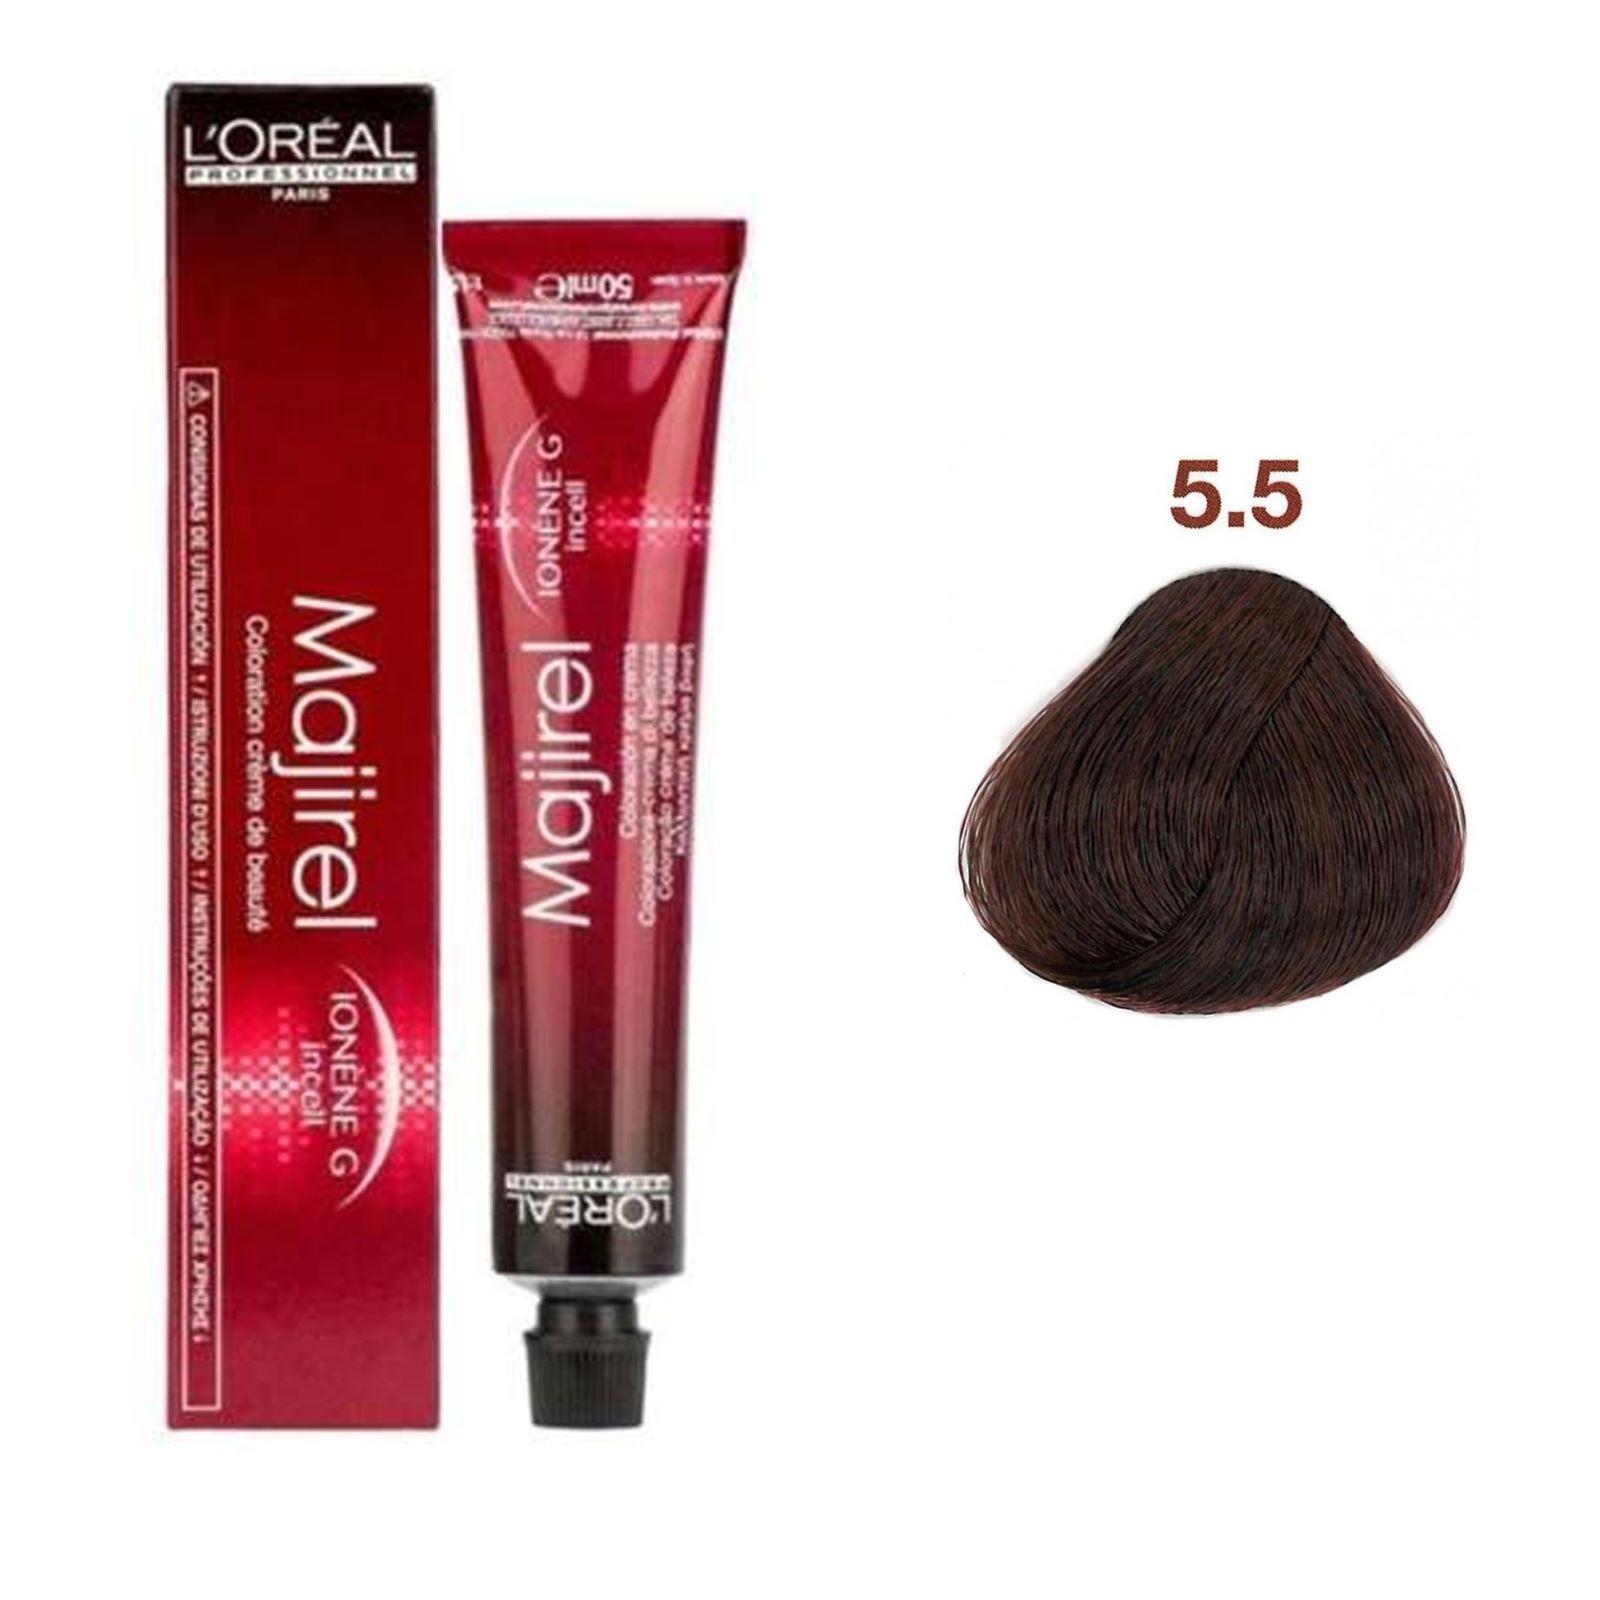 Loreal majirel high lift permanent profesional hair colour 55 loreal majirel high lift permanent profesional hair colour 55 light brown nvjuhfo Images